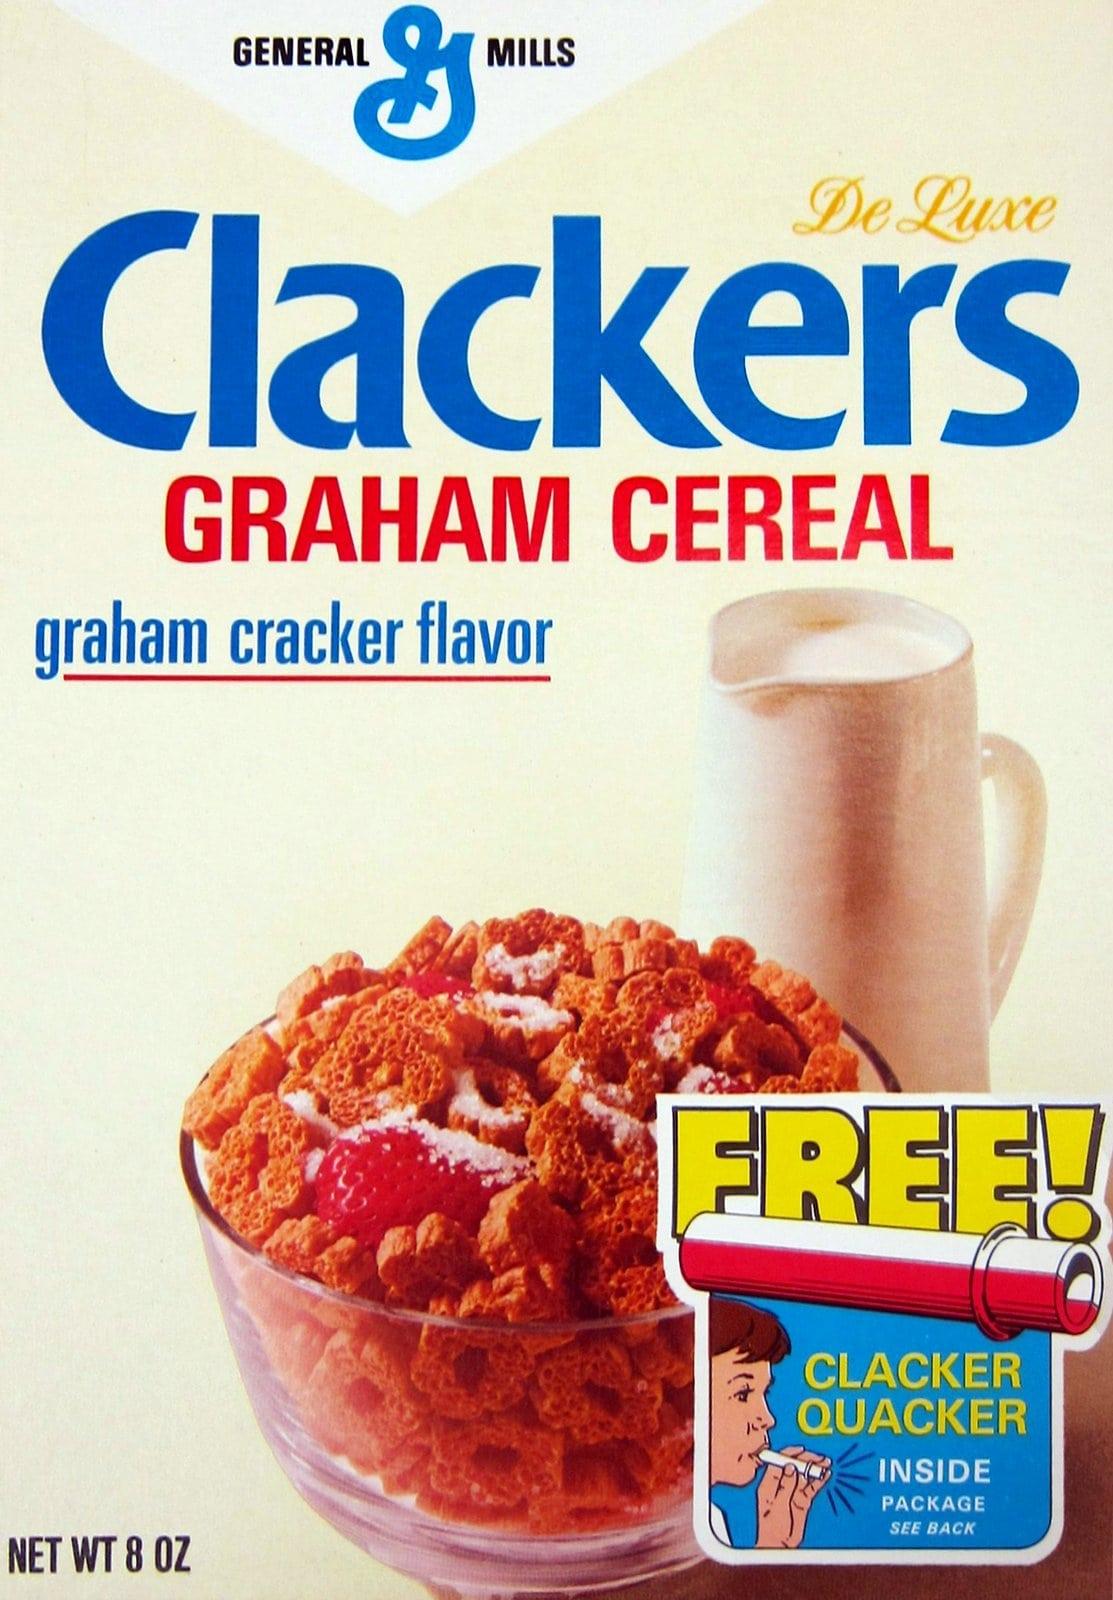 Vintage 1970s Clackers graham cracker flavor cereal